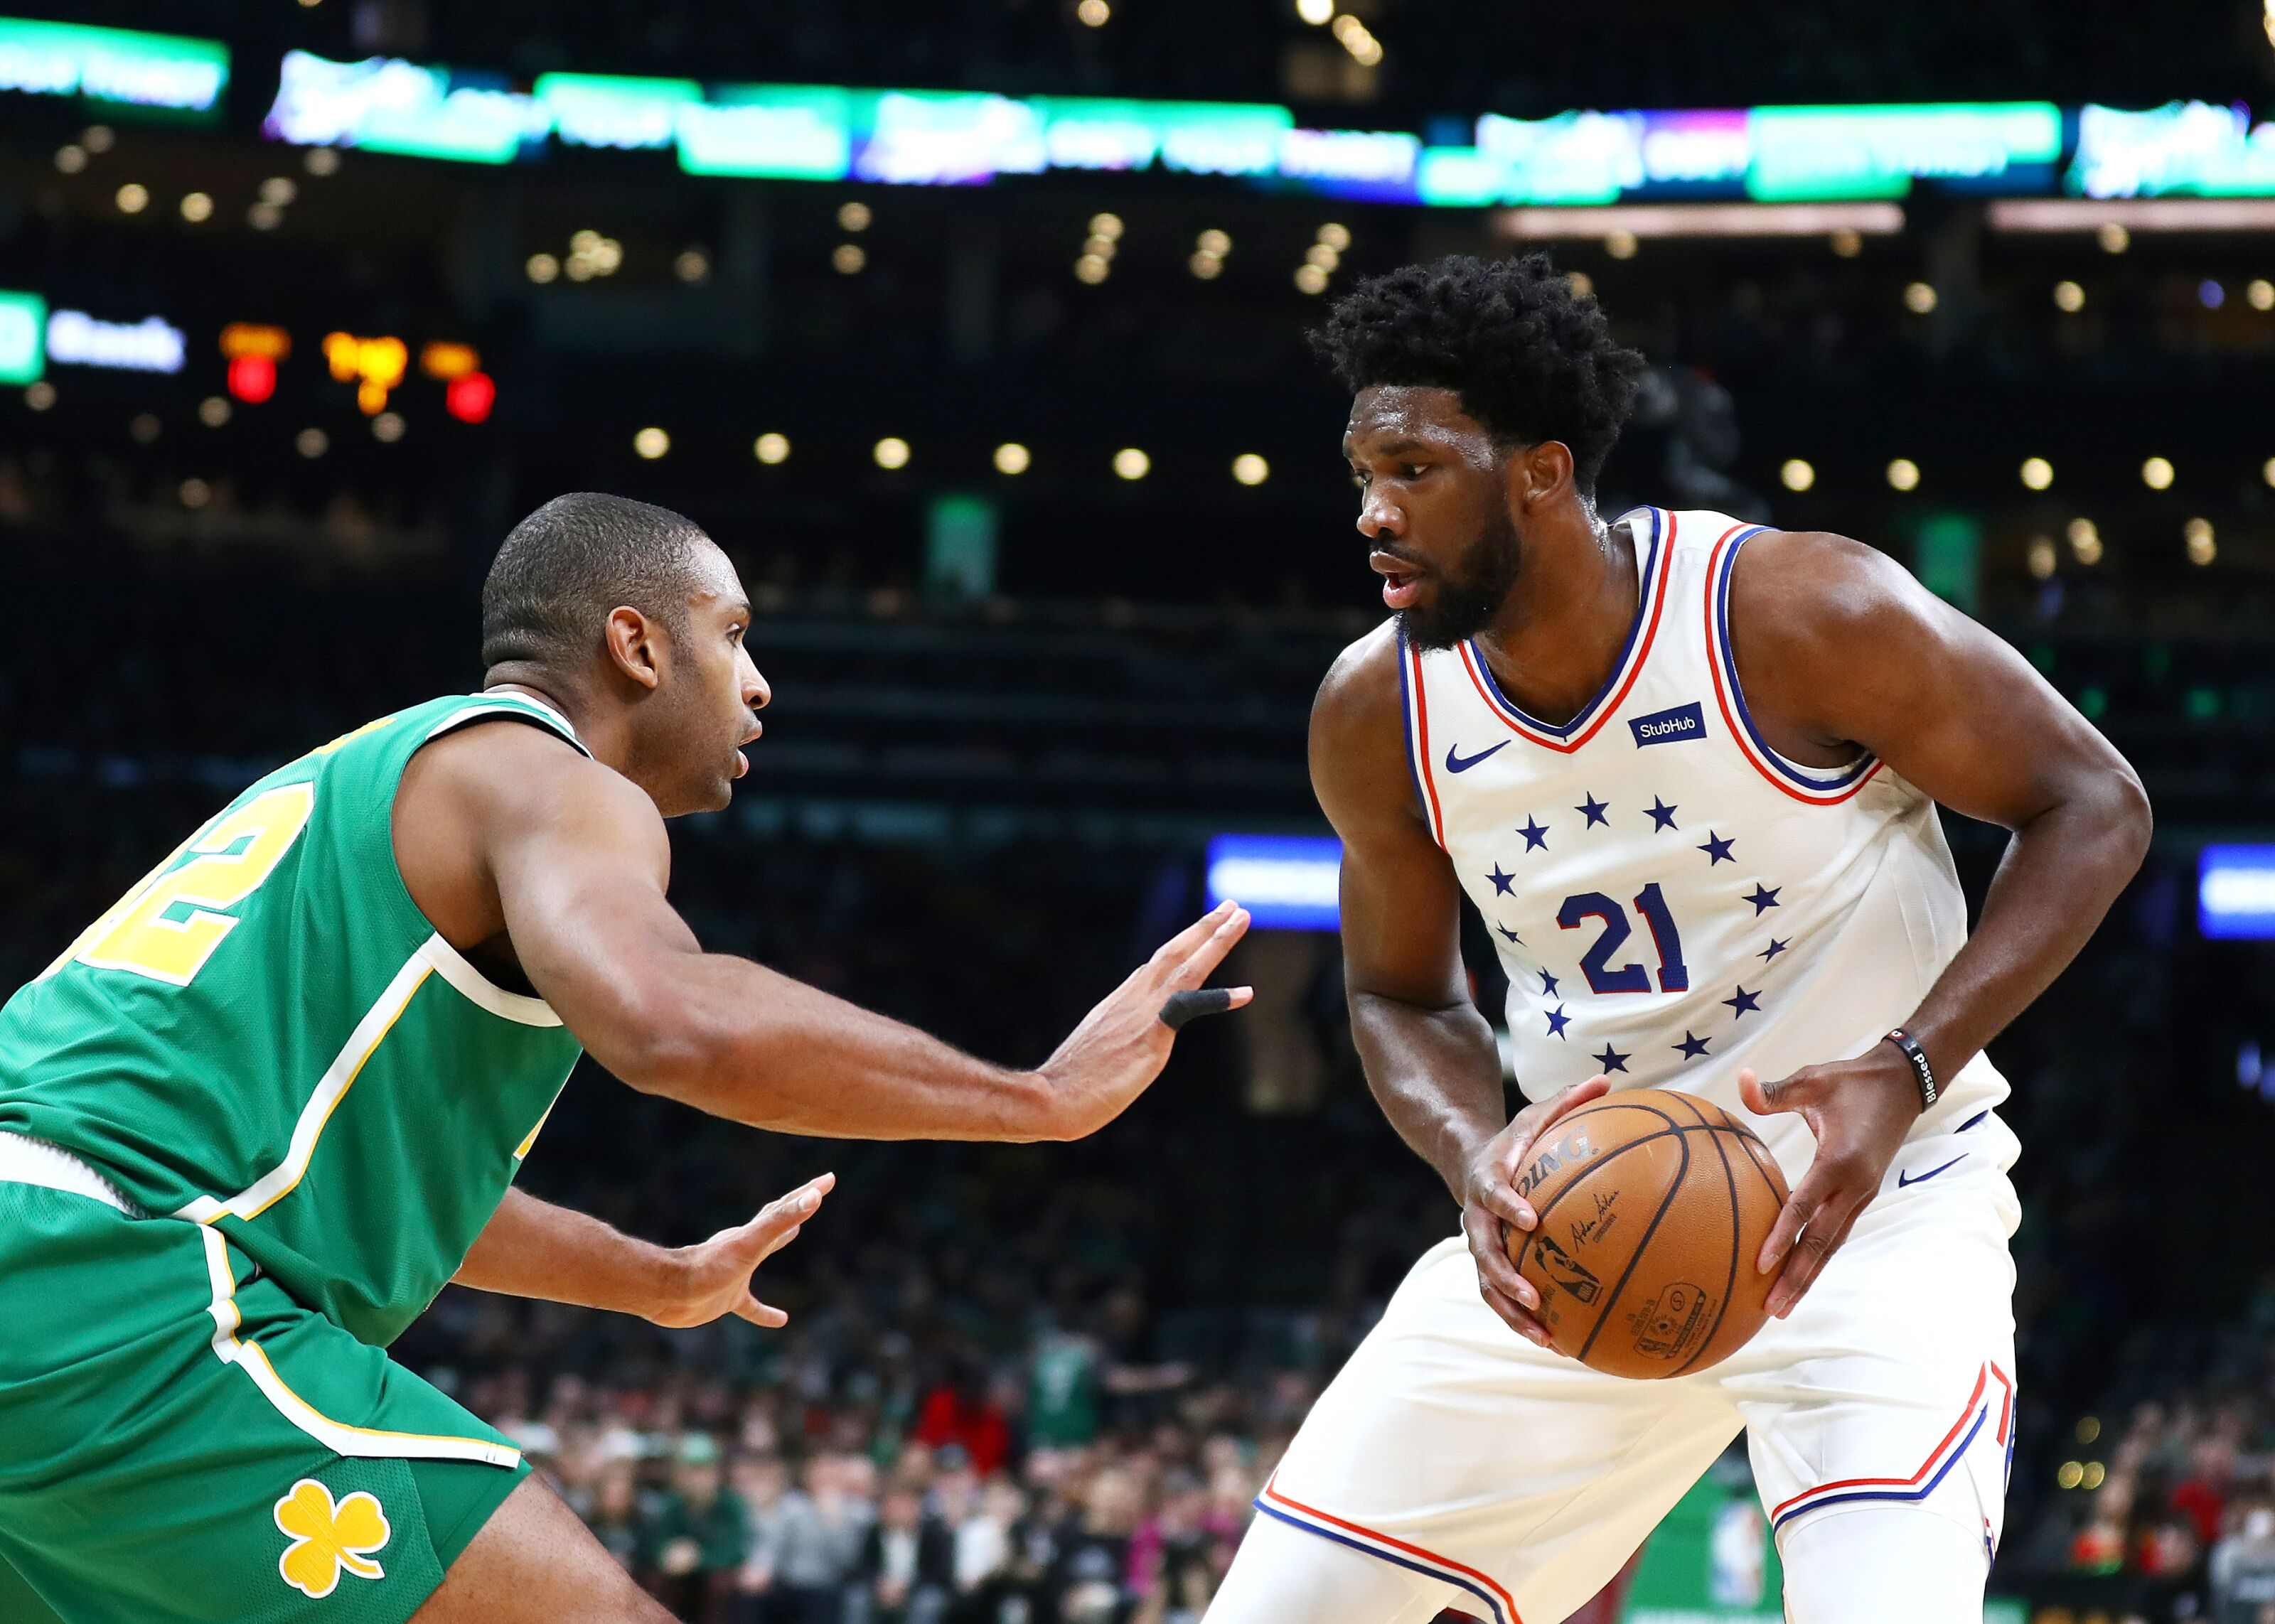 Philadelphia 76ers: A look into the Joel Embiid-Al Horford partnership